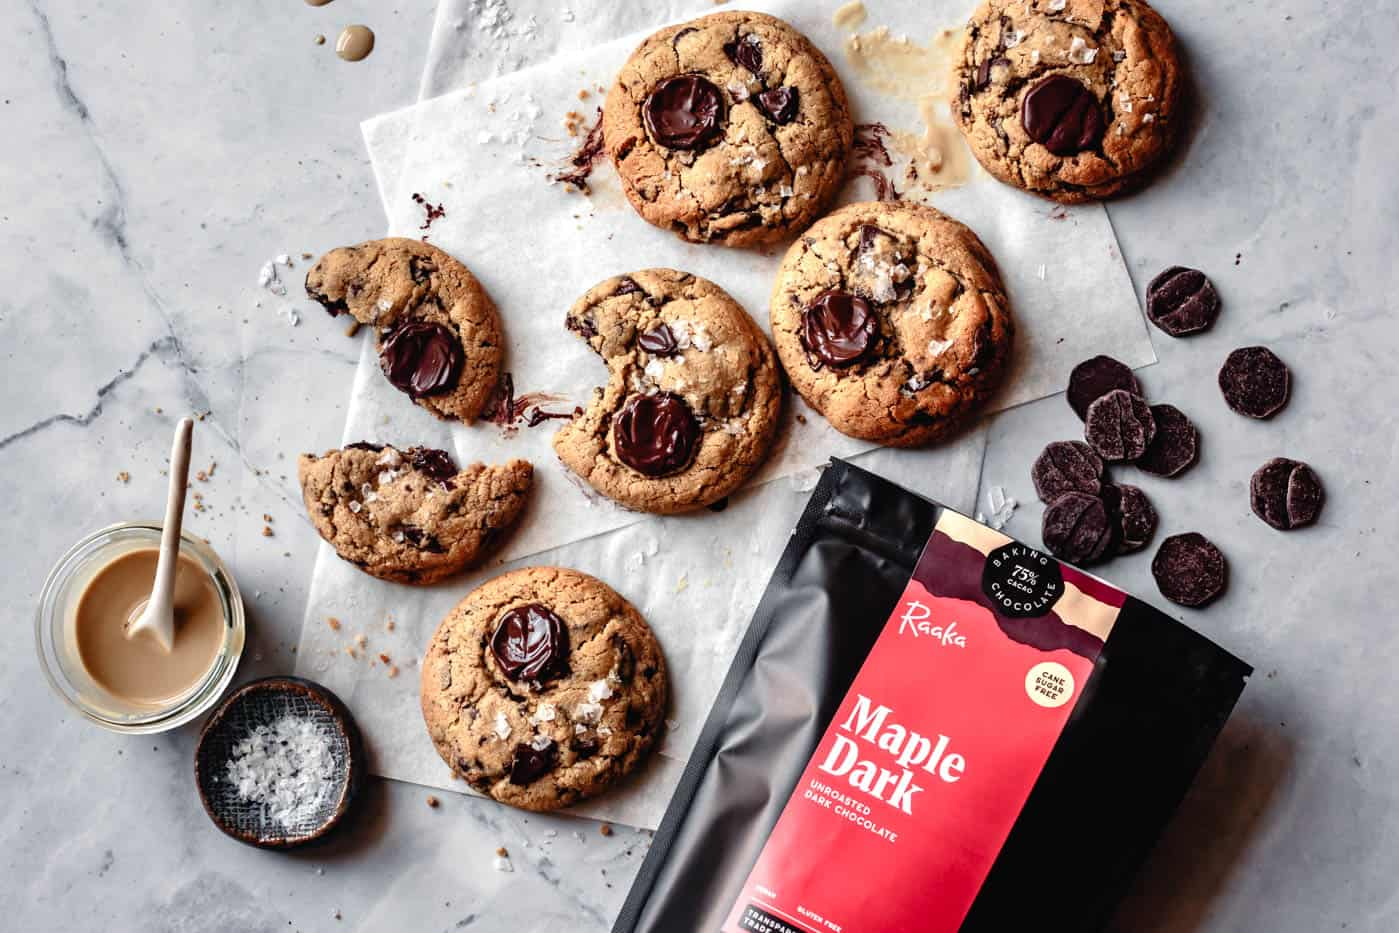 tahini cookies with a bag of maple dark chocolate, tahini, and flaky salt